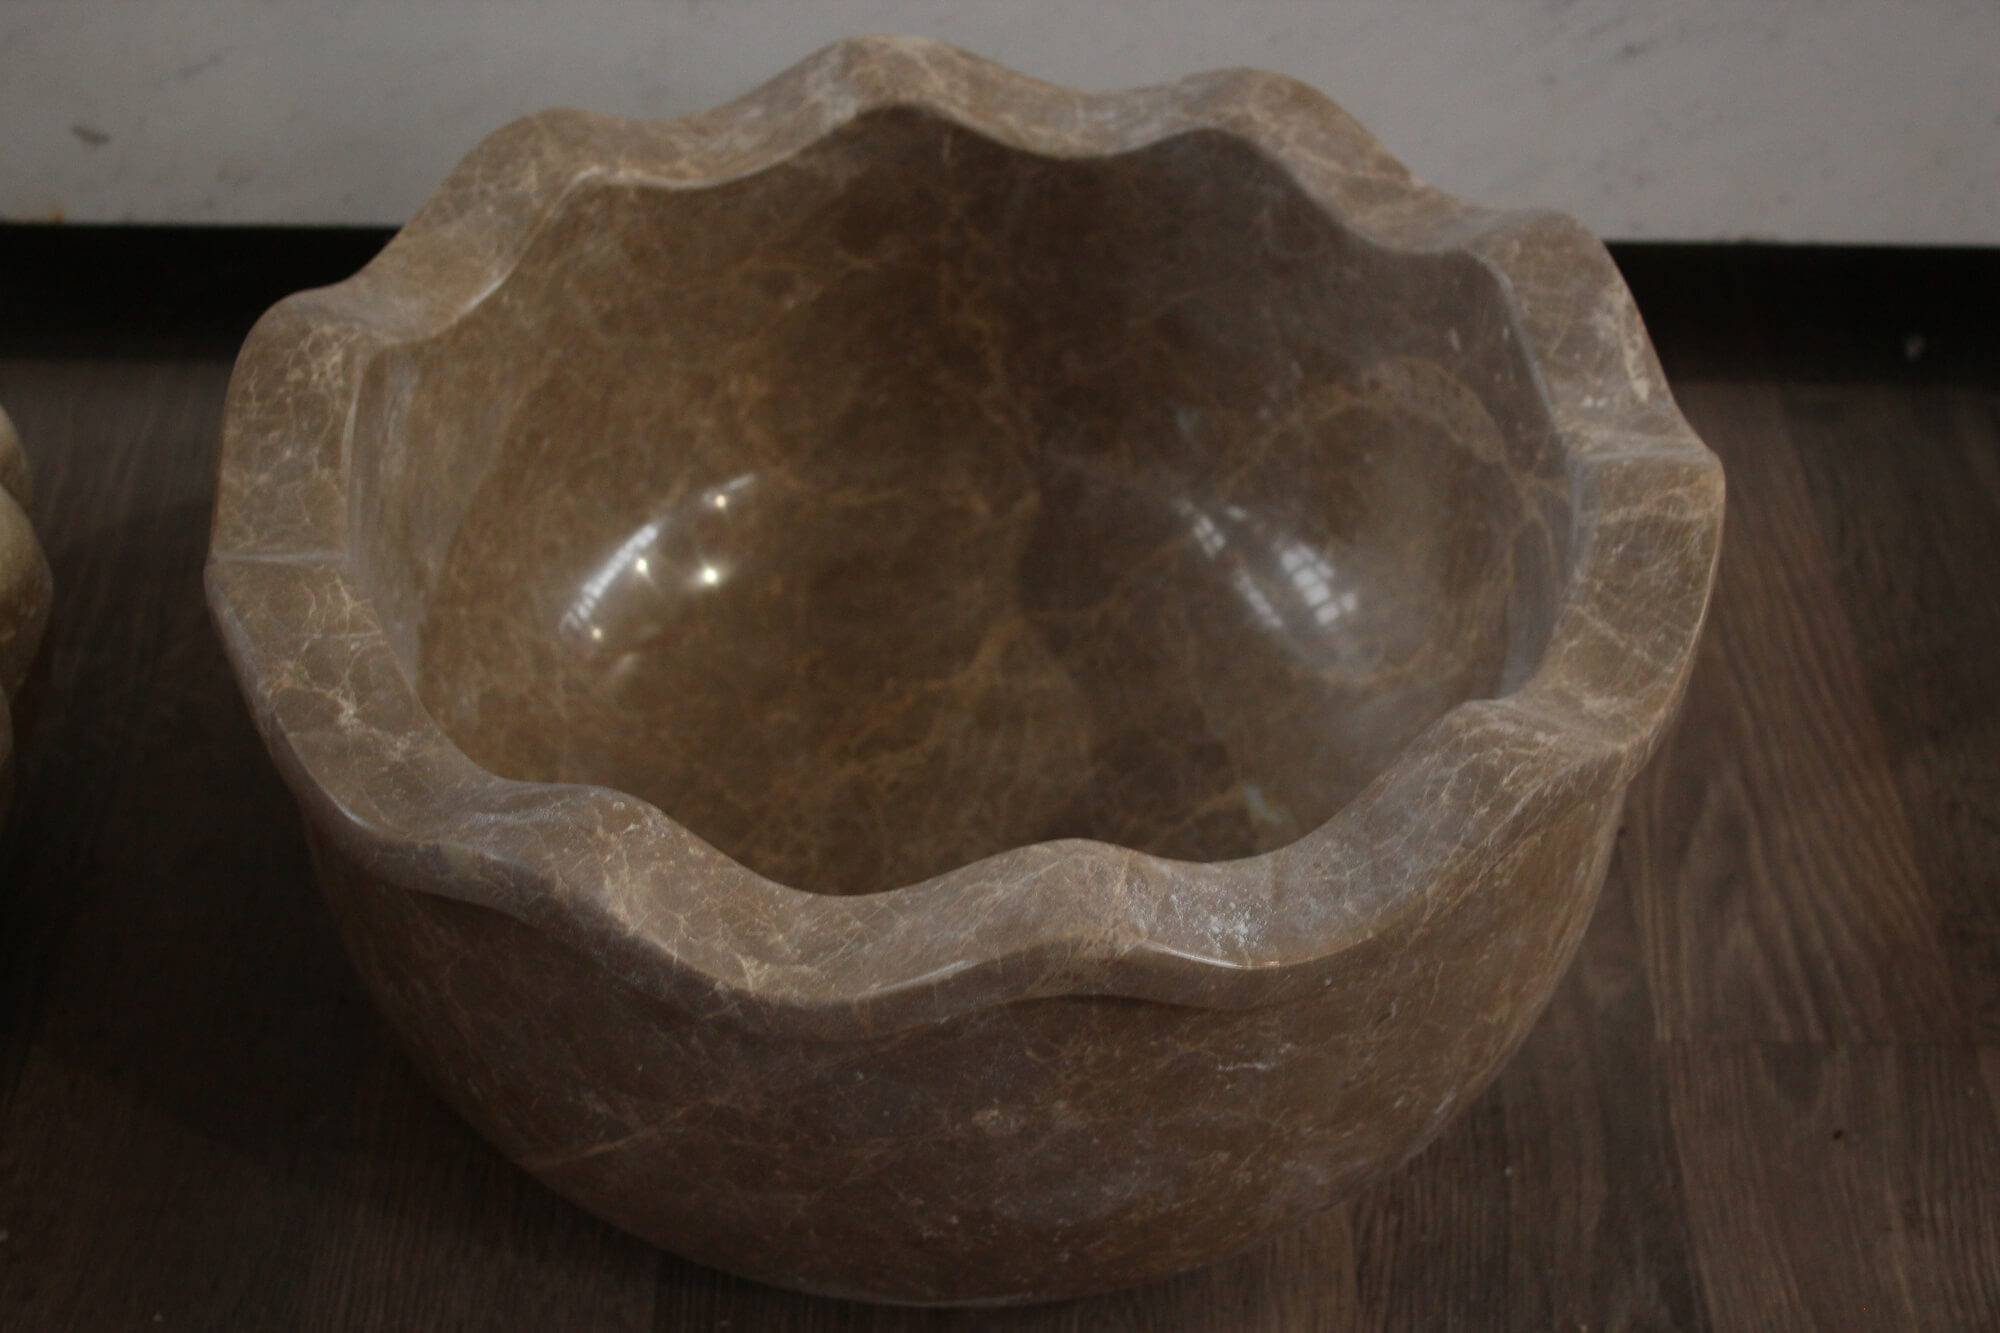 Мраморная курна в виде чаши, Турция фото 1 — изелия и проекты от Bevers Marmyr